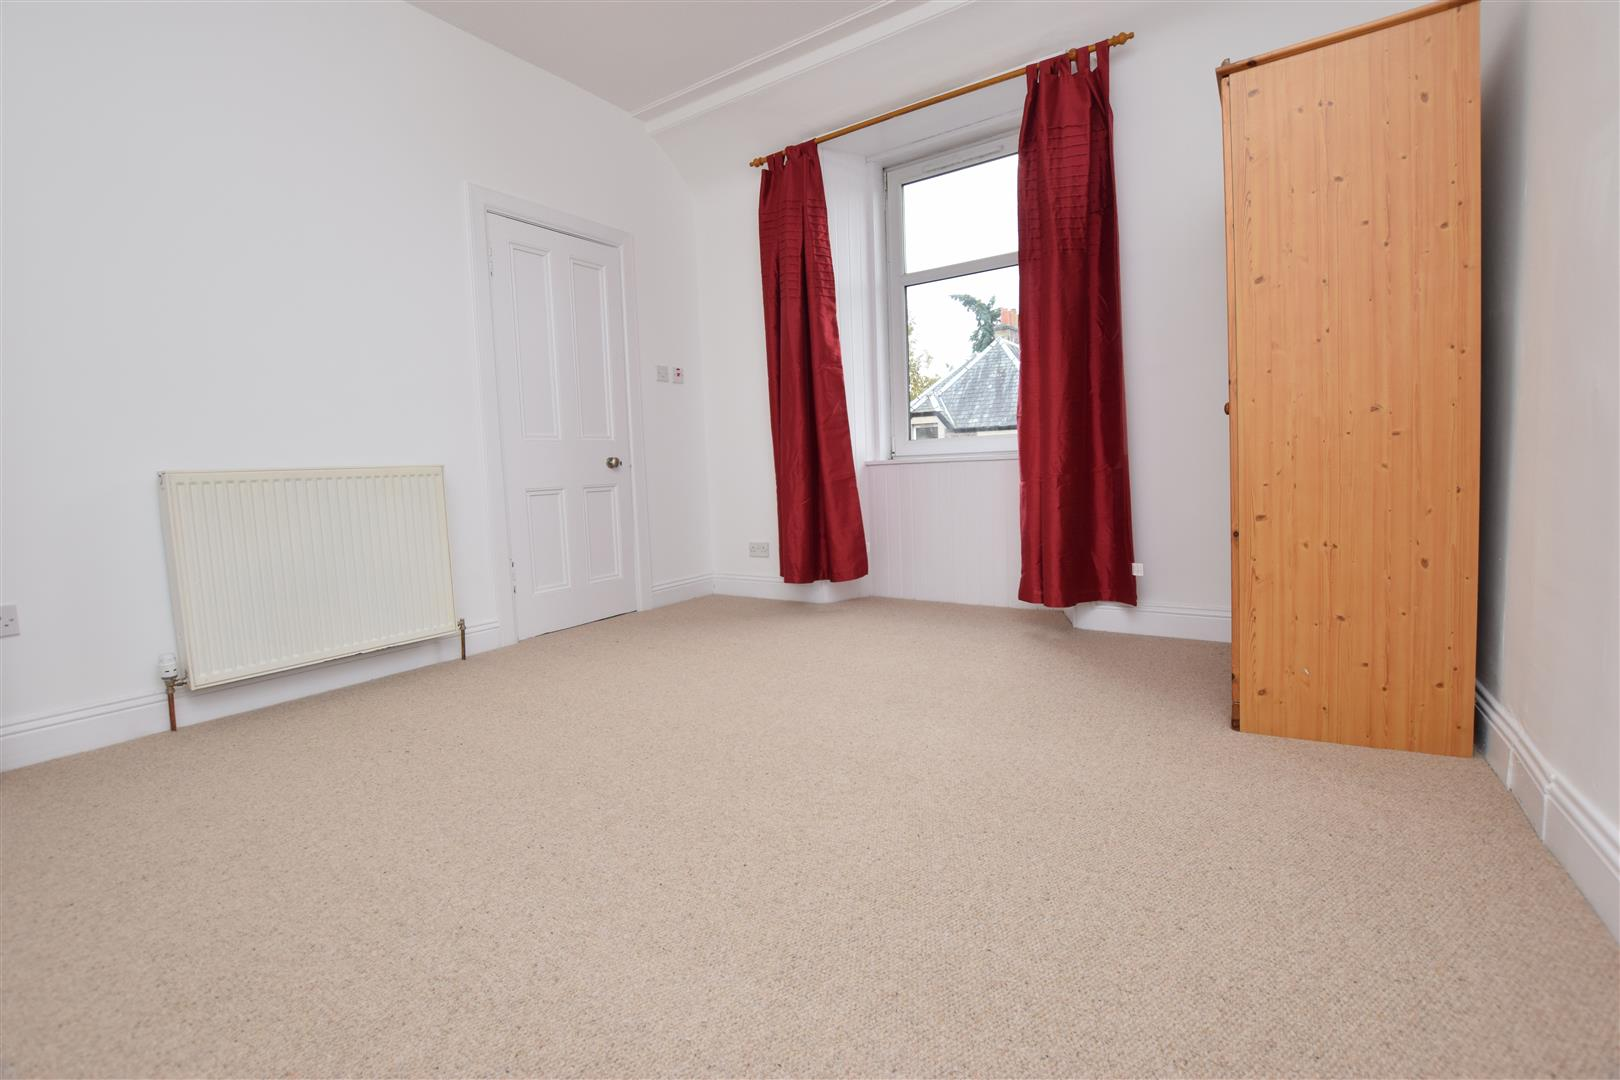 1, Lodge Street, Crieff, Perthshire, PH7 4DW, UK